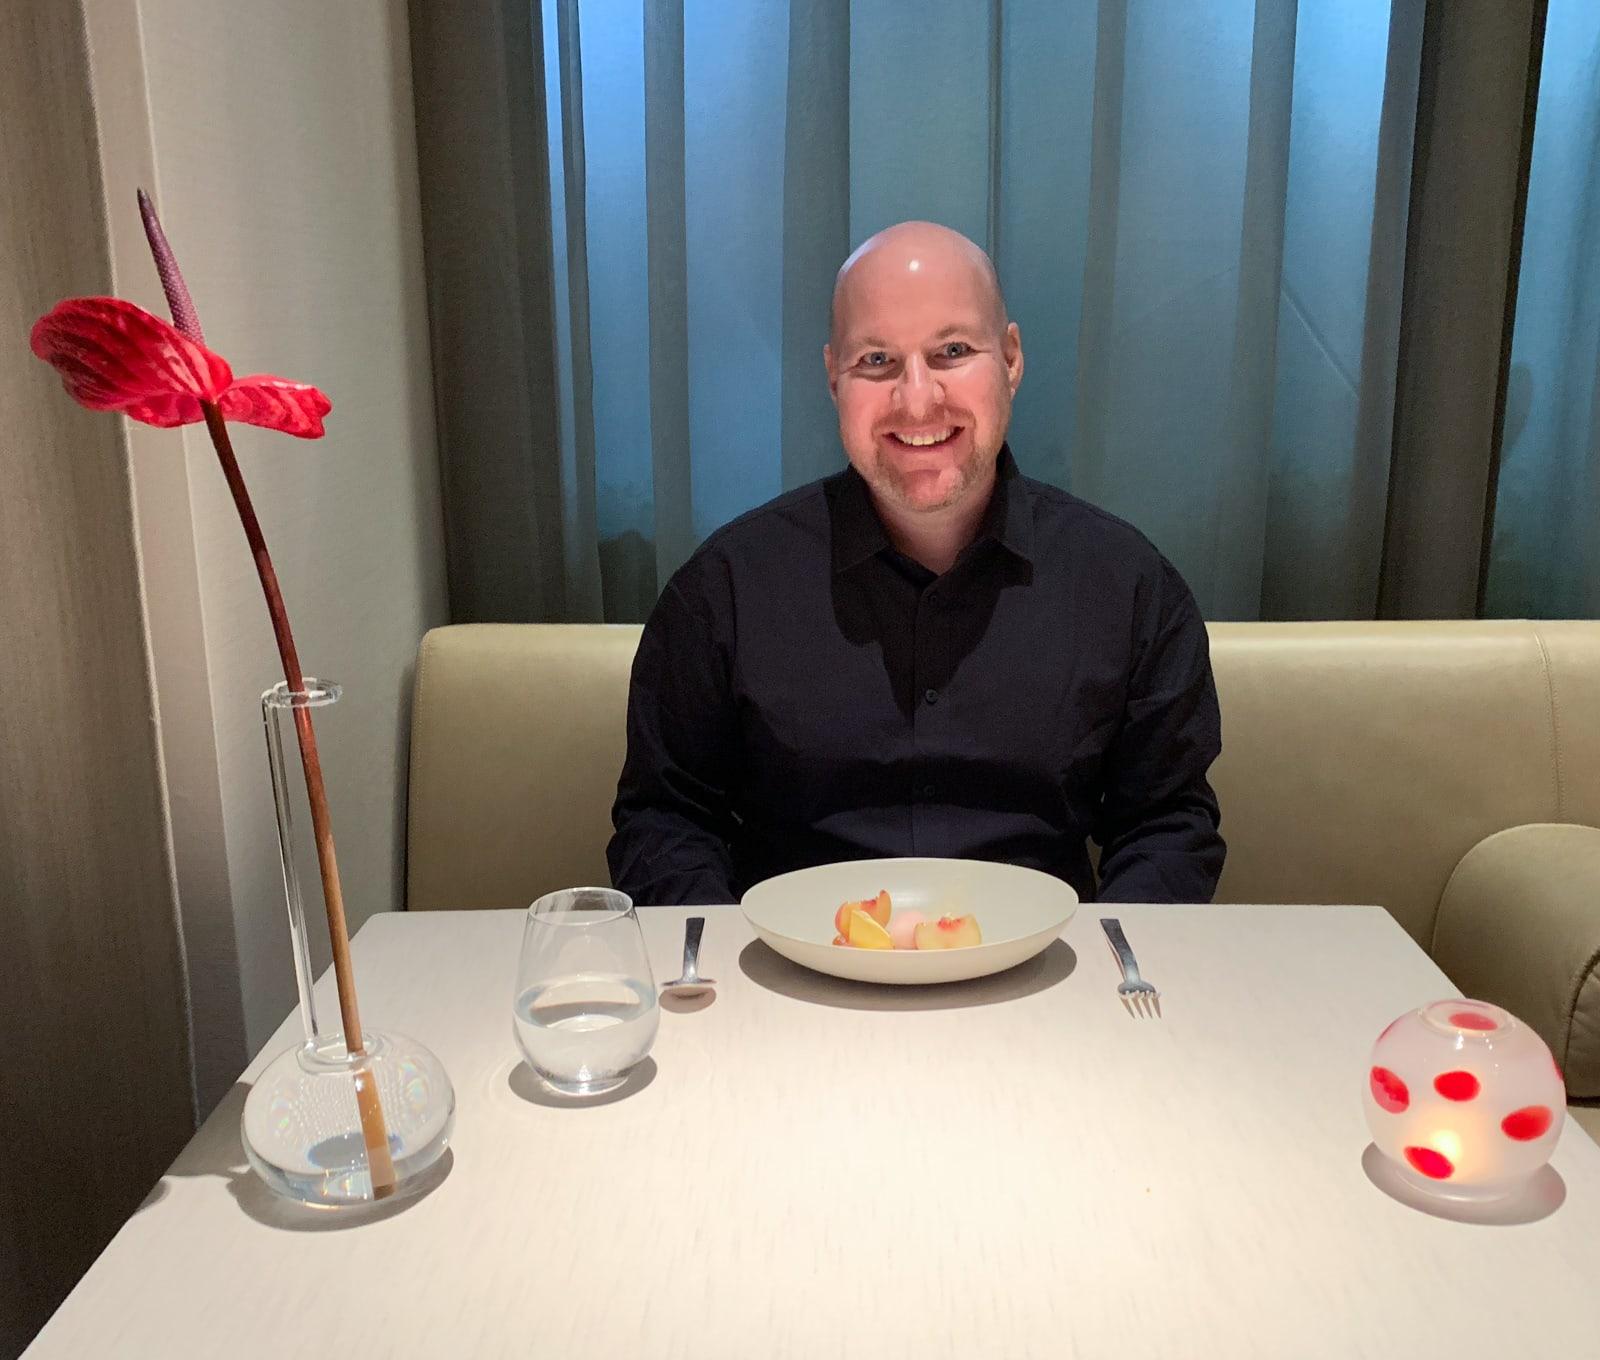 Eating alone at VUN Andrea Aprea in Milan, Italy